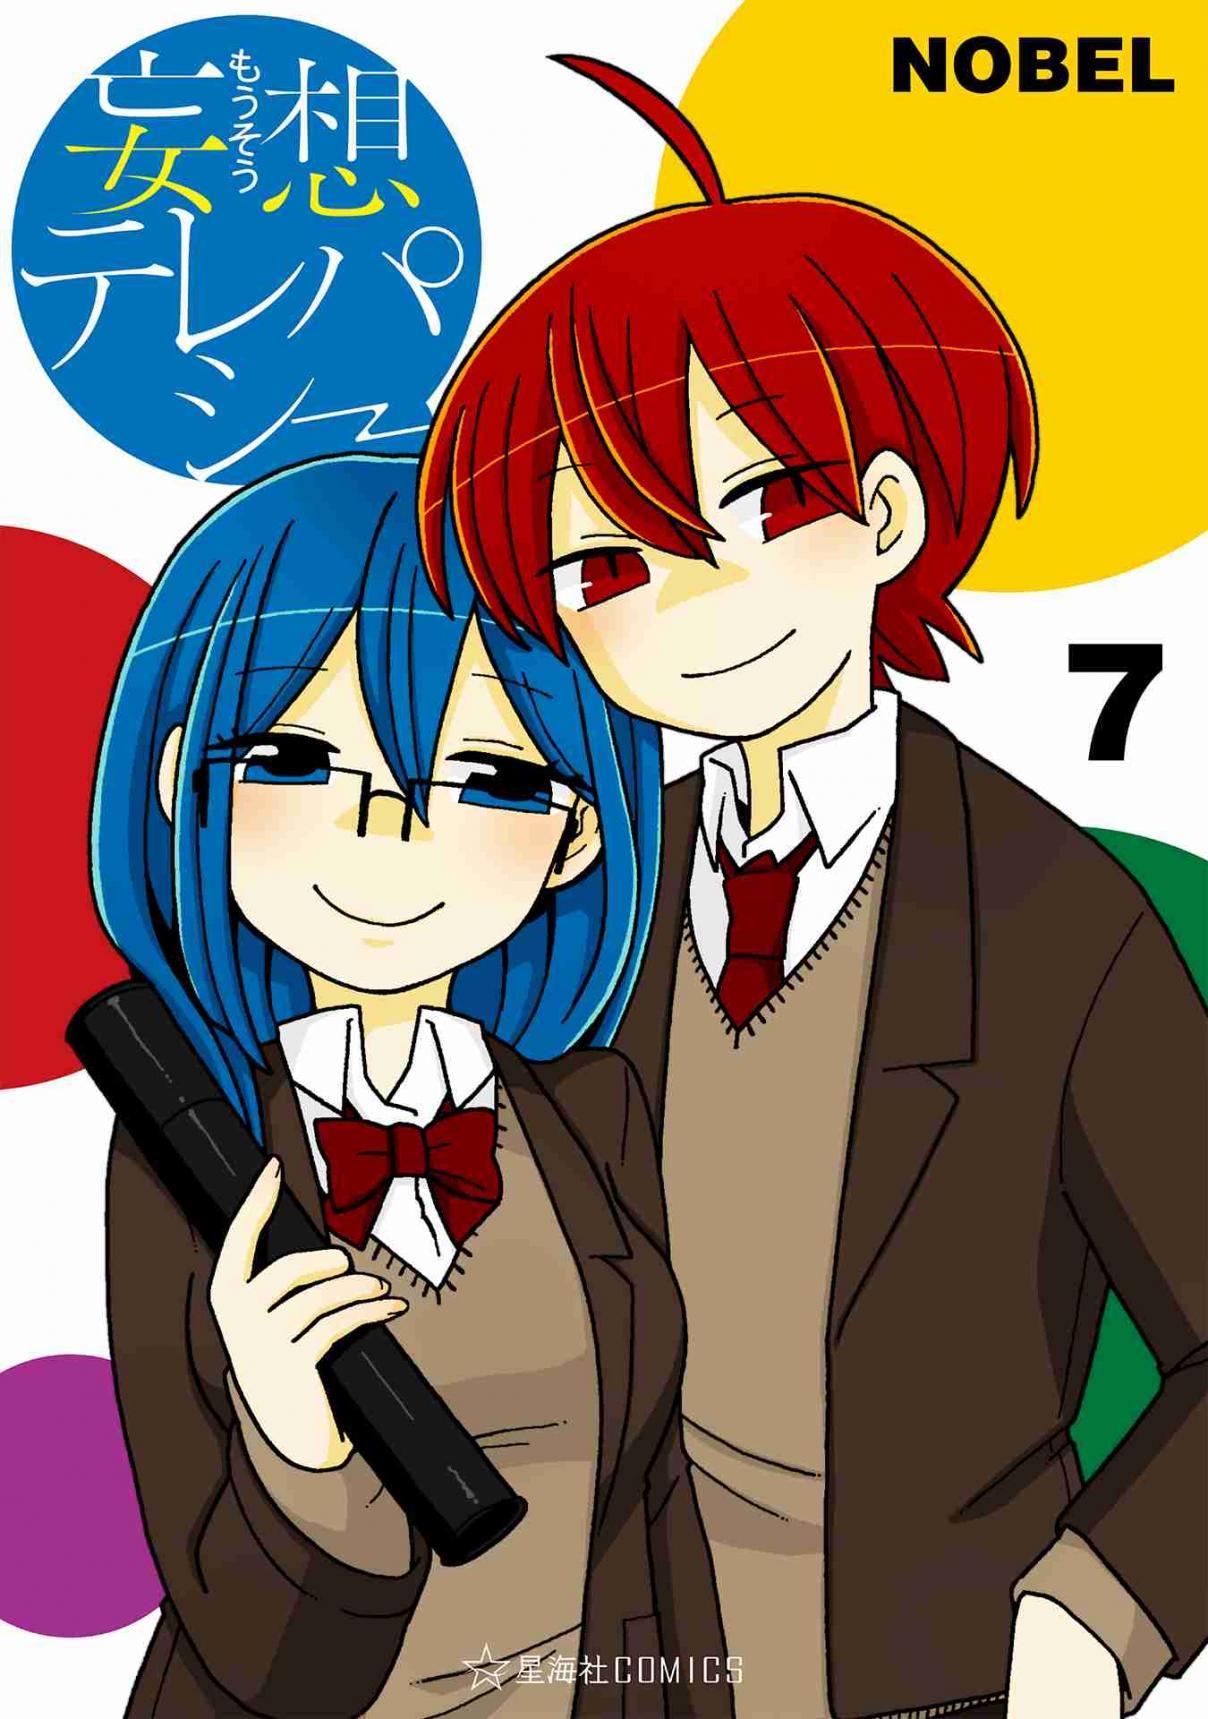 https://manga.mangadogs.com/comics/pic2/26/90/1370425/09c38a1ae4f990f5180c6a586fa2f3d3.jpg Page 1